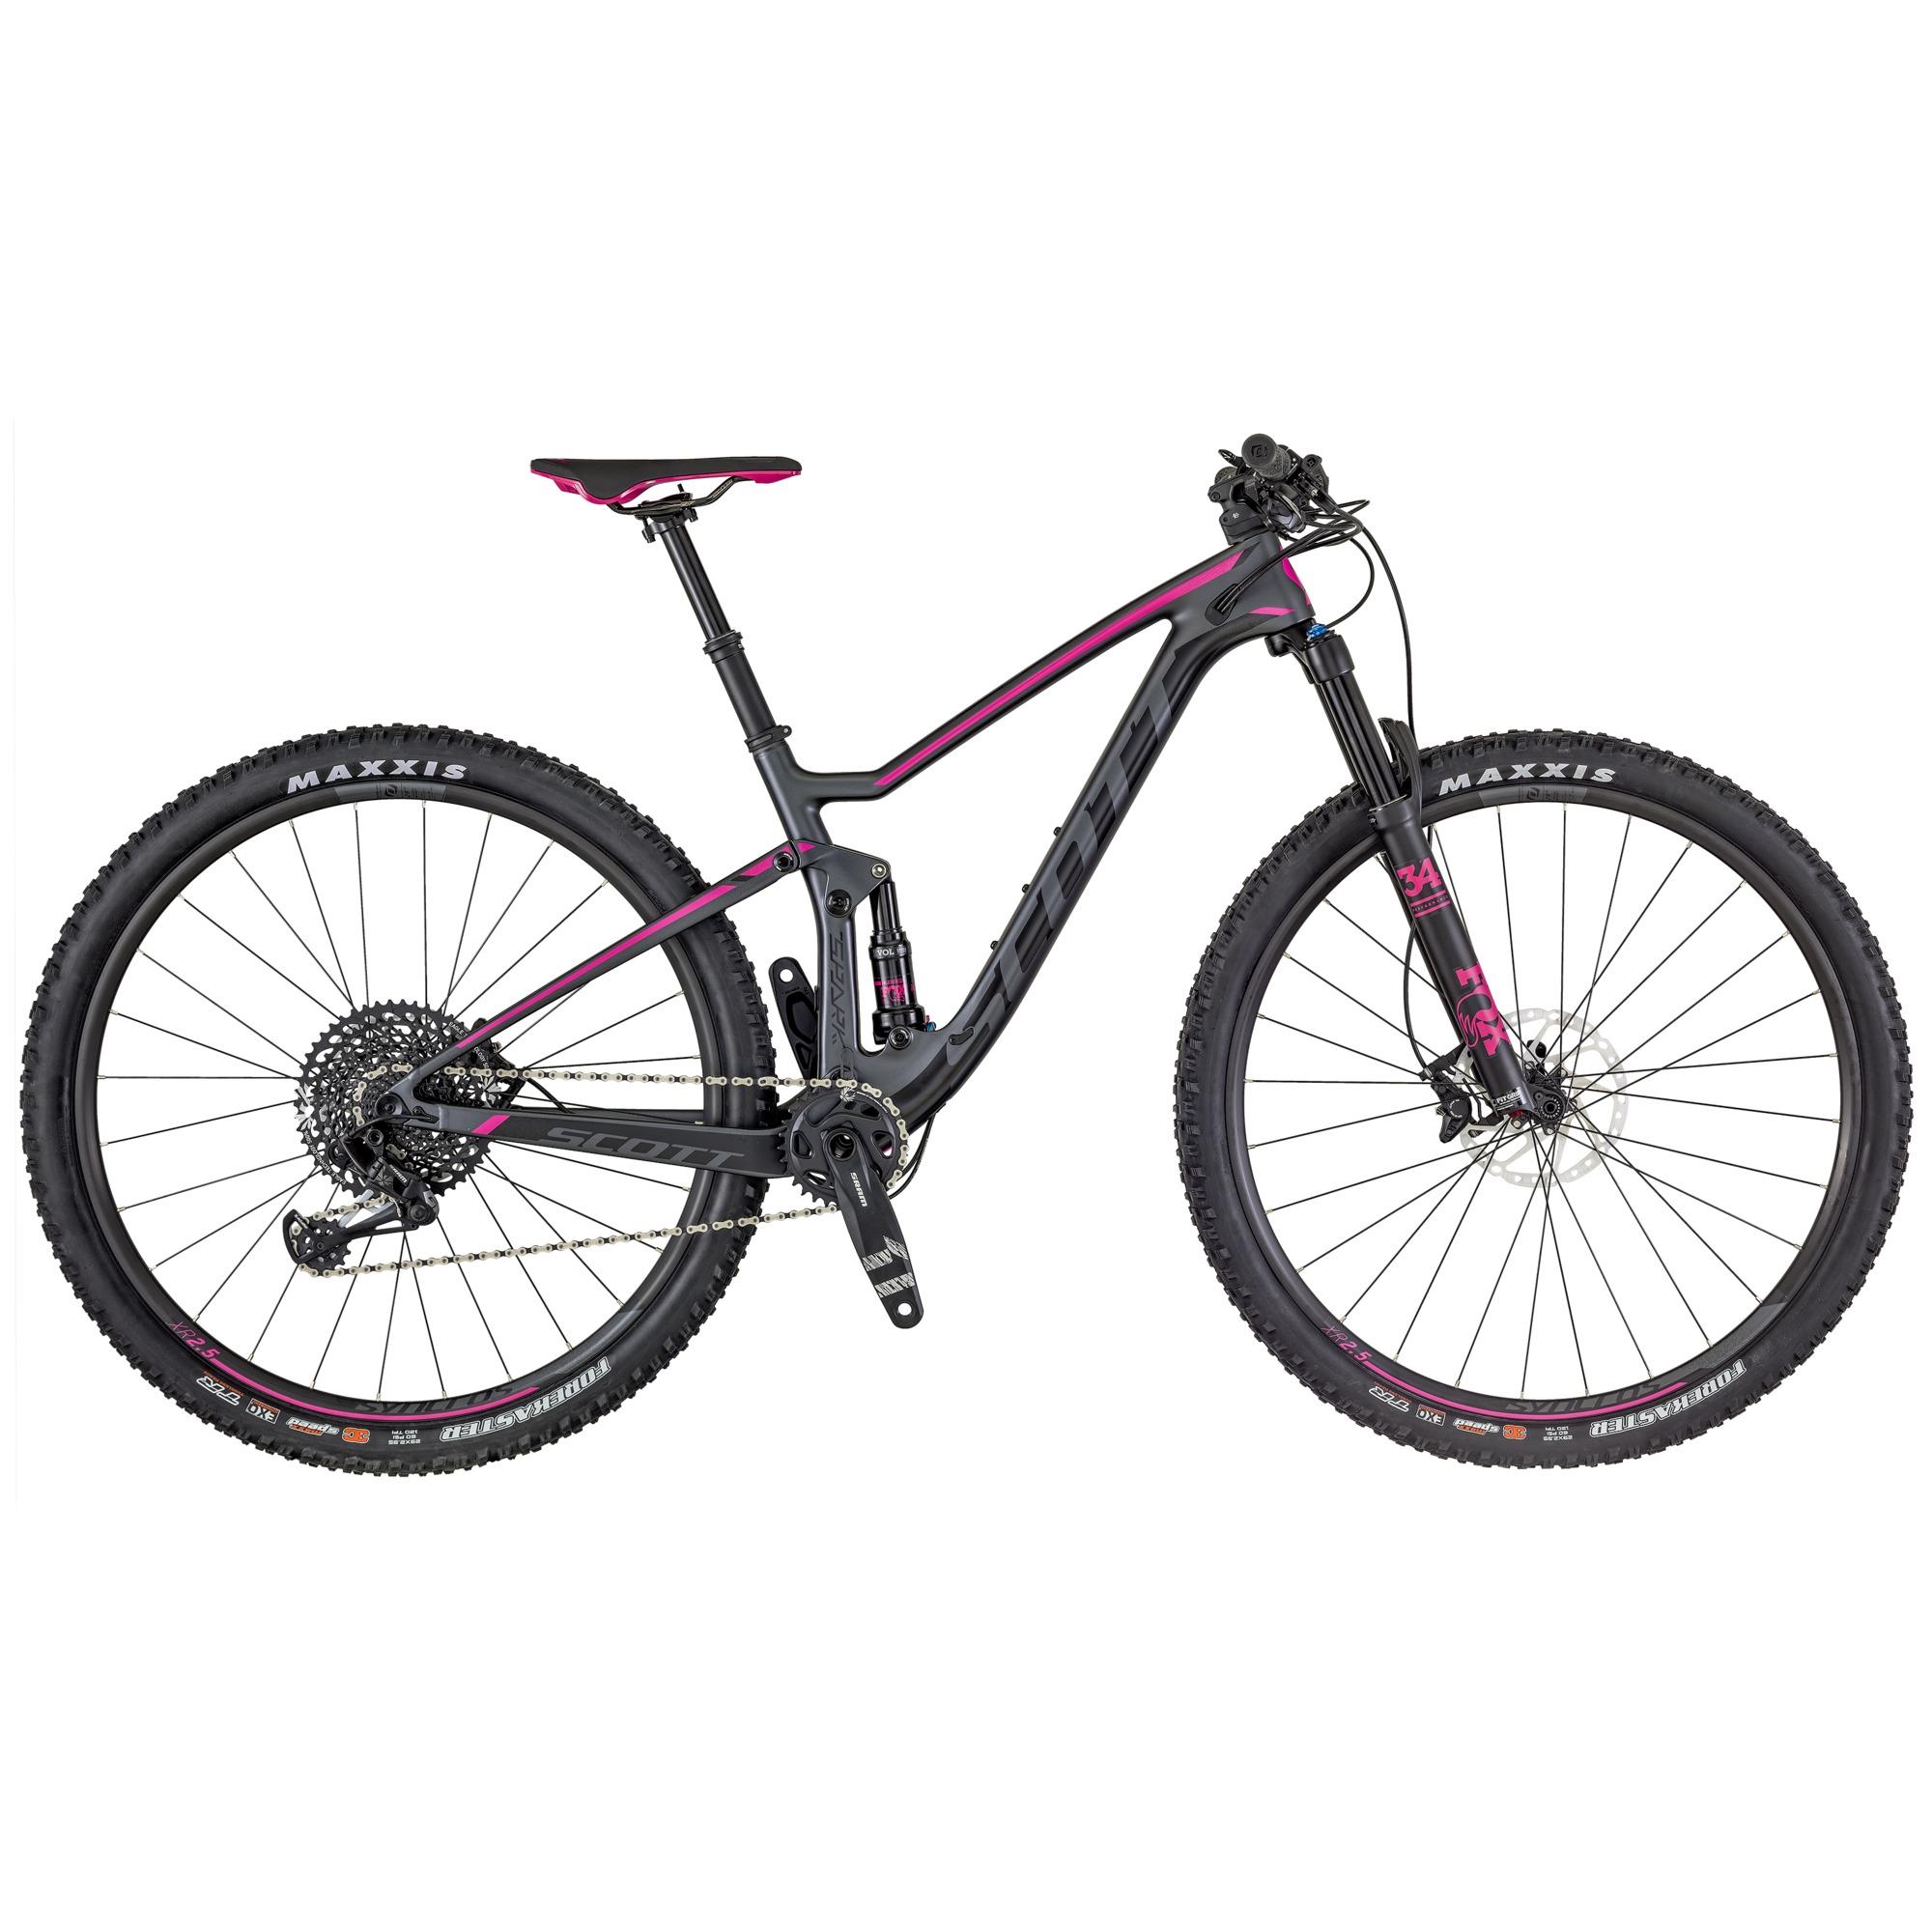 SCOTT Contessa Spark 910 Bike M - Rad & Dämpferklinik GmbH